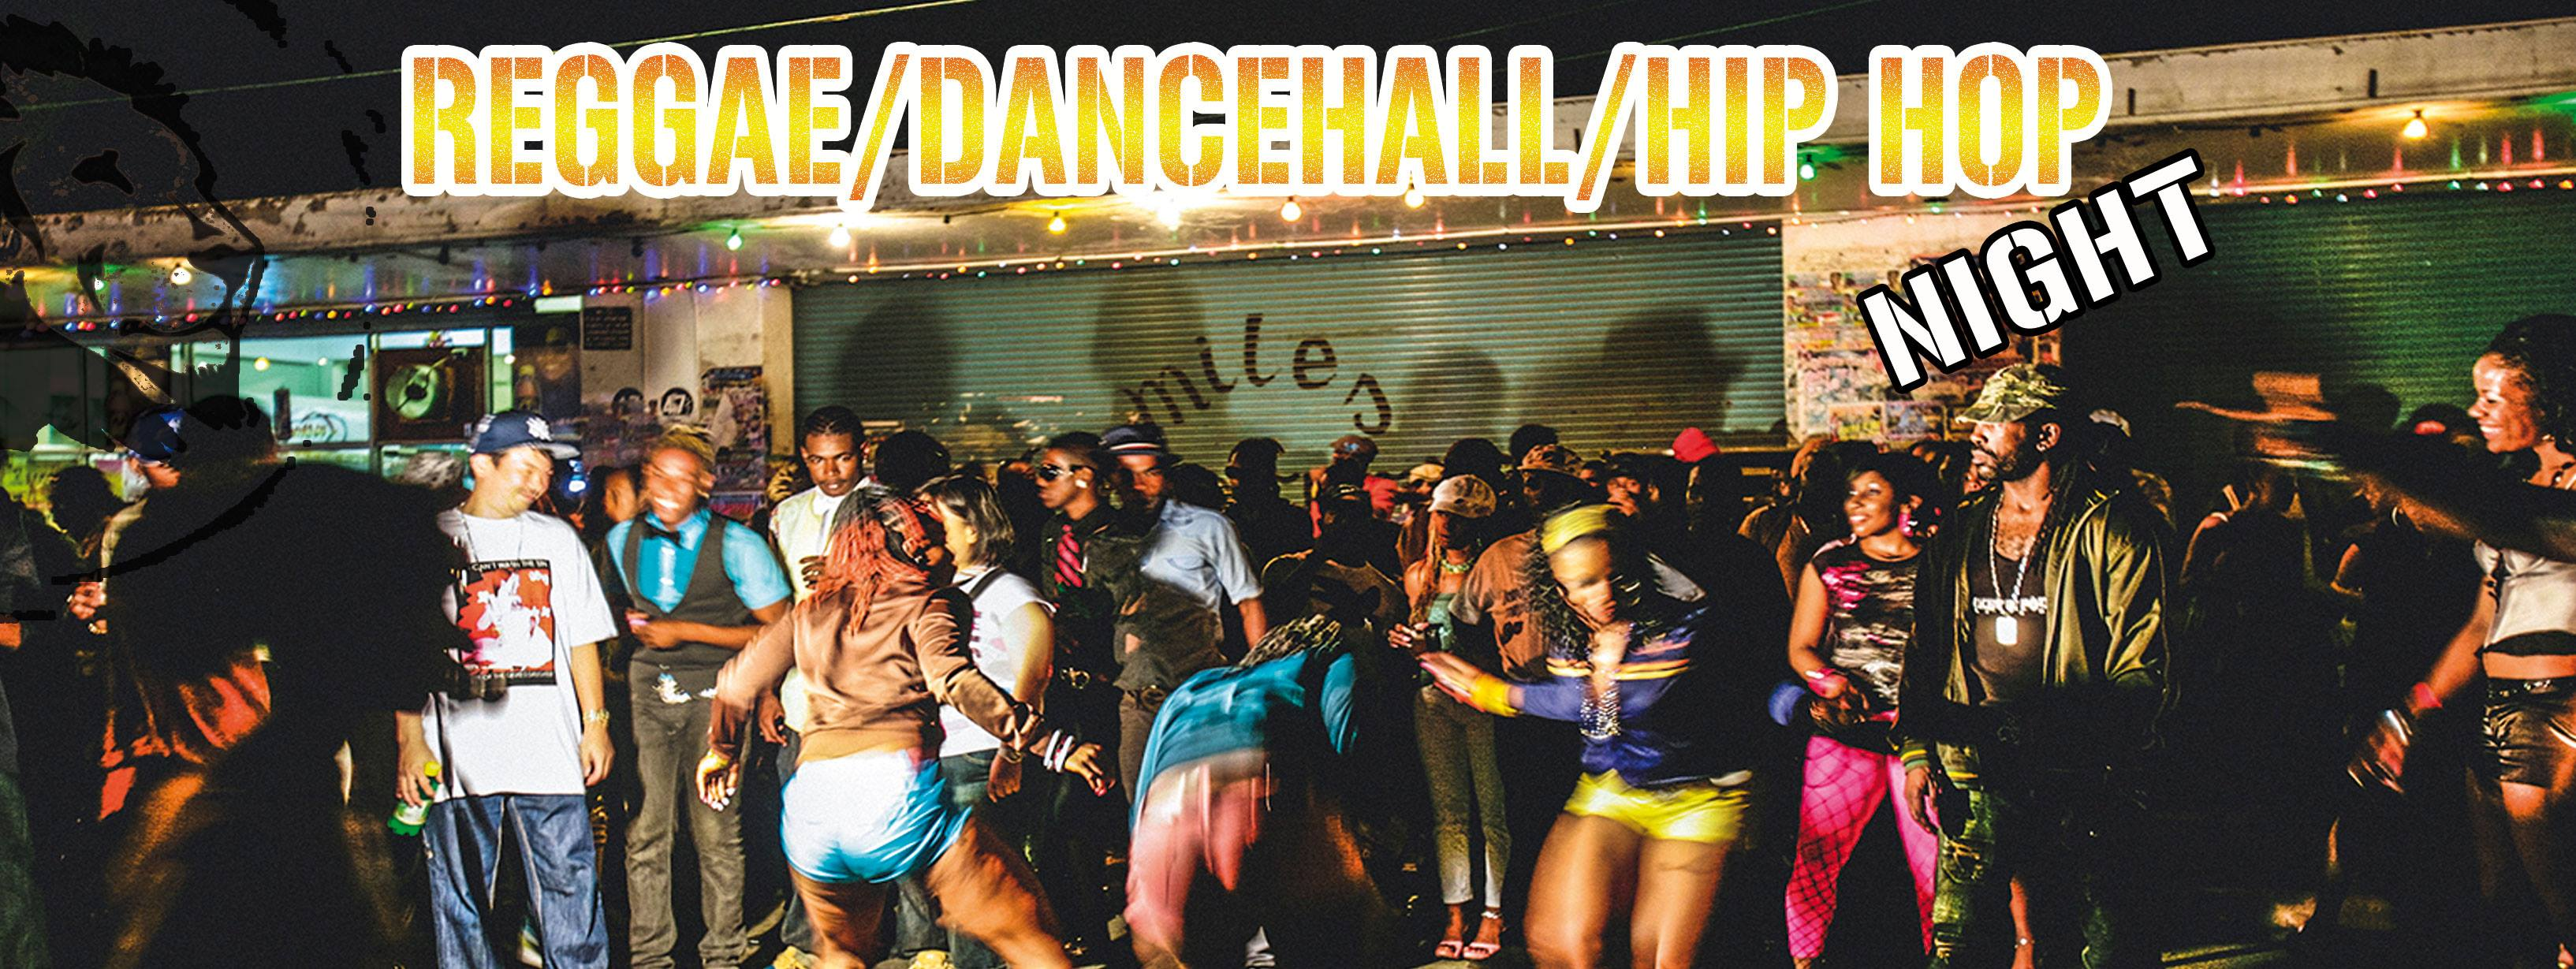 REGGAE/DANCEHALL/HIP HOP NIGHT || Samstag, 05.05.18